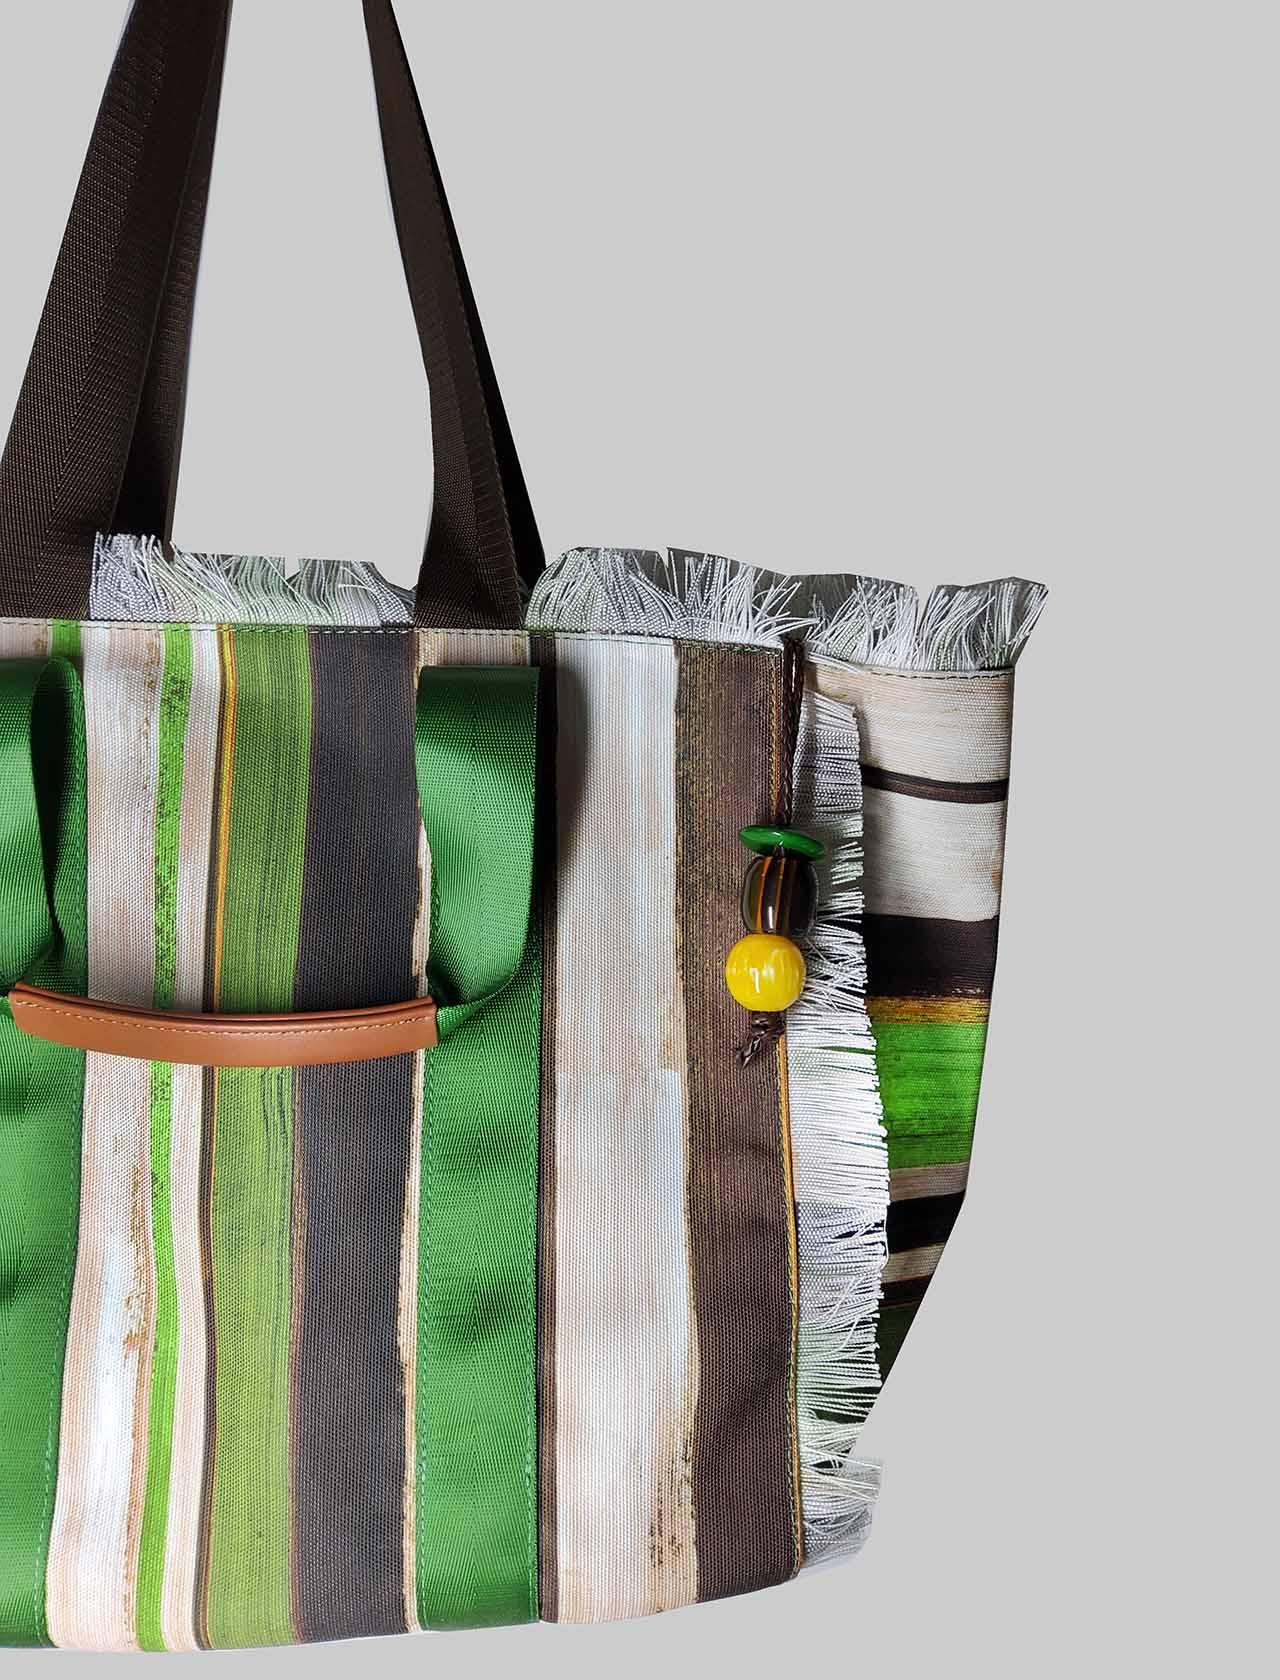 Borsa Donna Shopping Painted Stripes in Cotone a Fantasia Verde e Naturale Maliparmi | Borse e zaini | BH026010135C6022